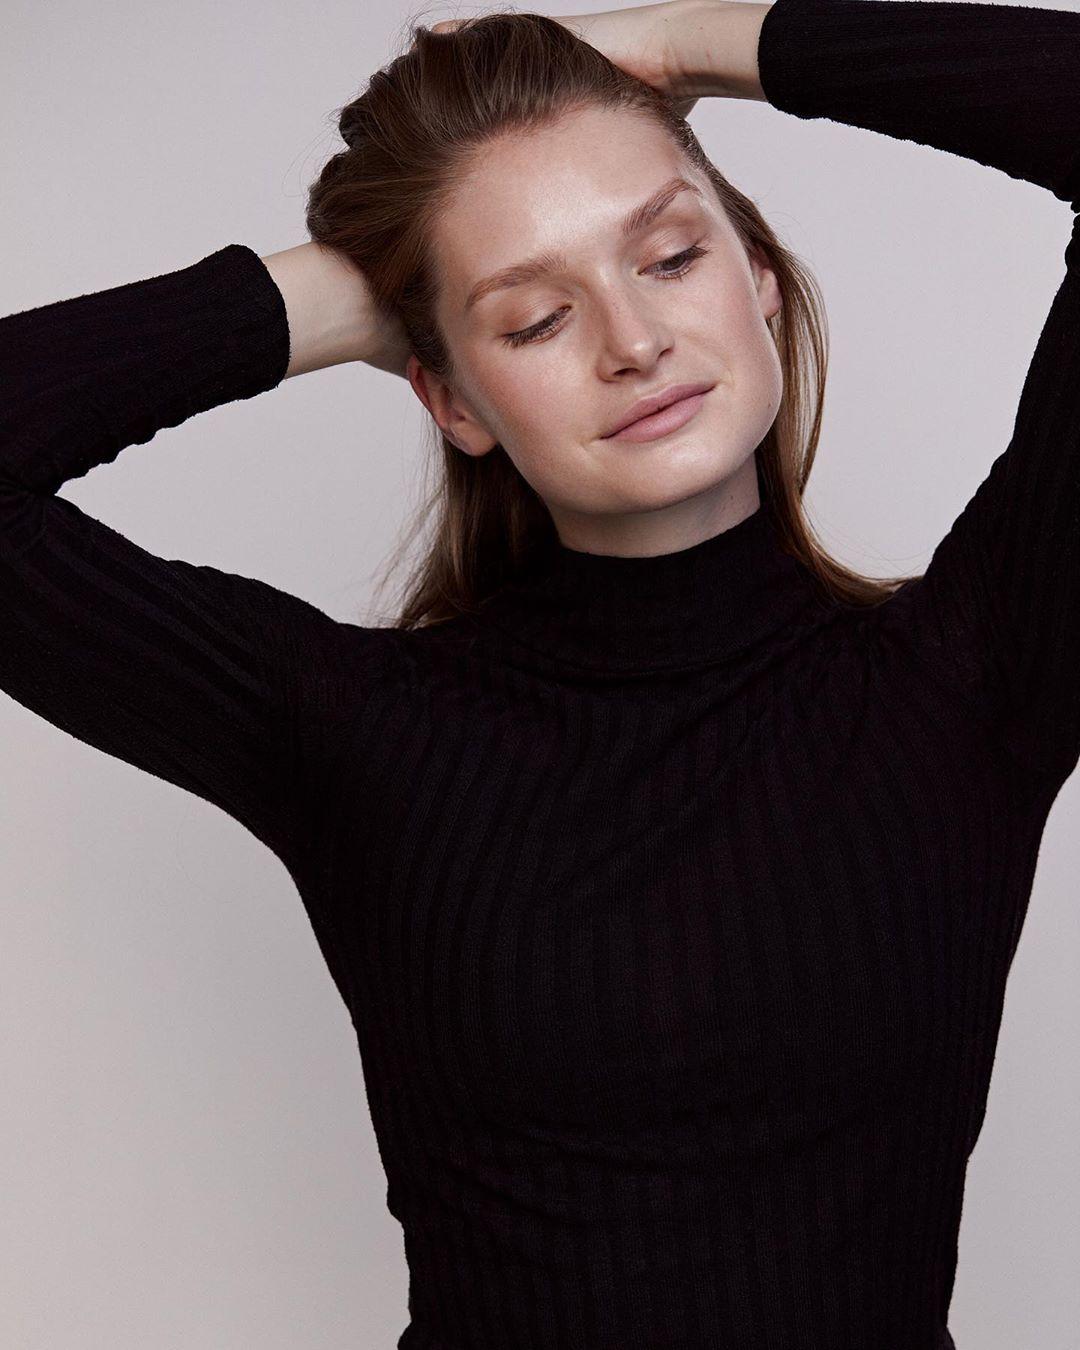 Johanna-Gronholm-Wallpapers-Insta-Fit-Bio-1